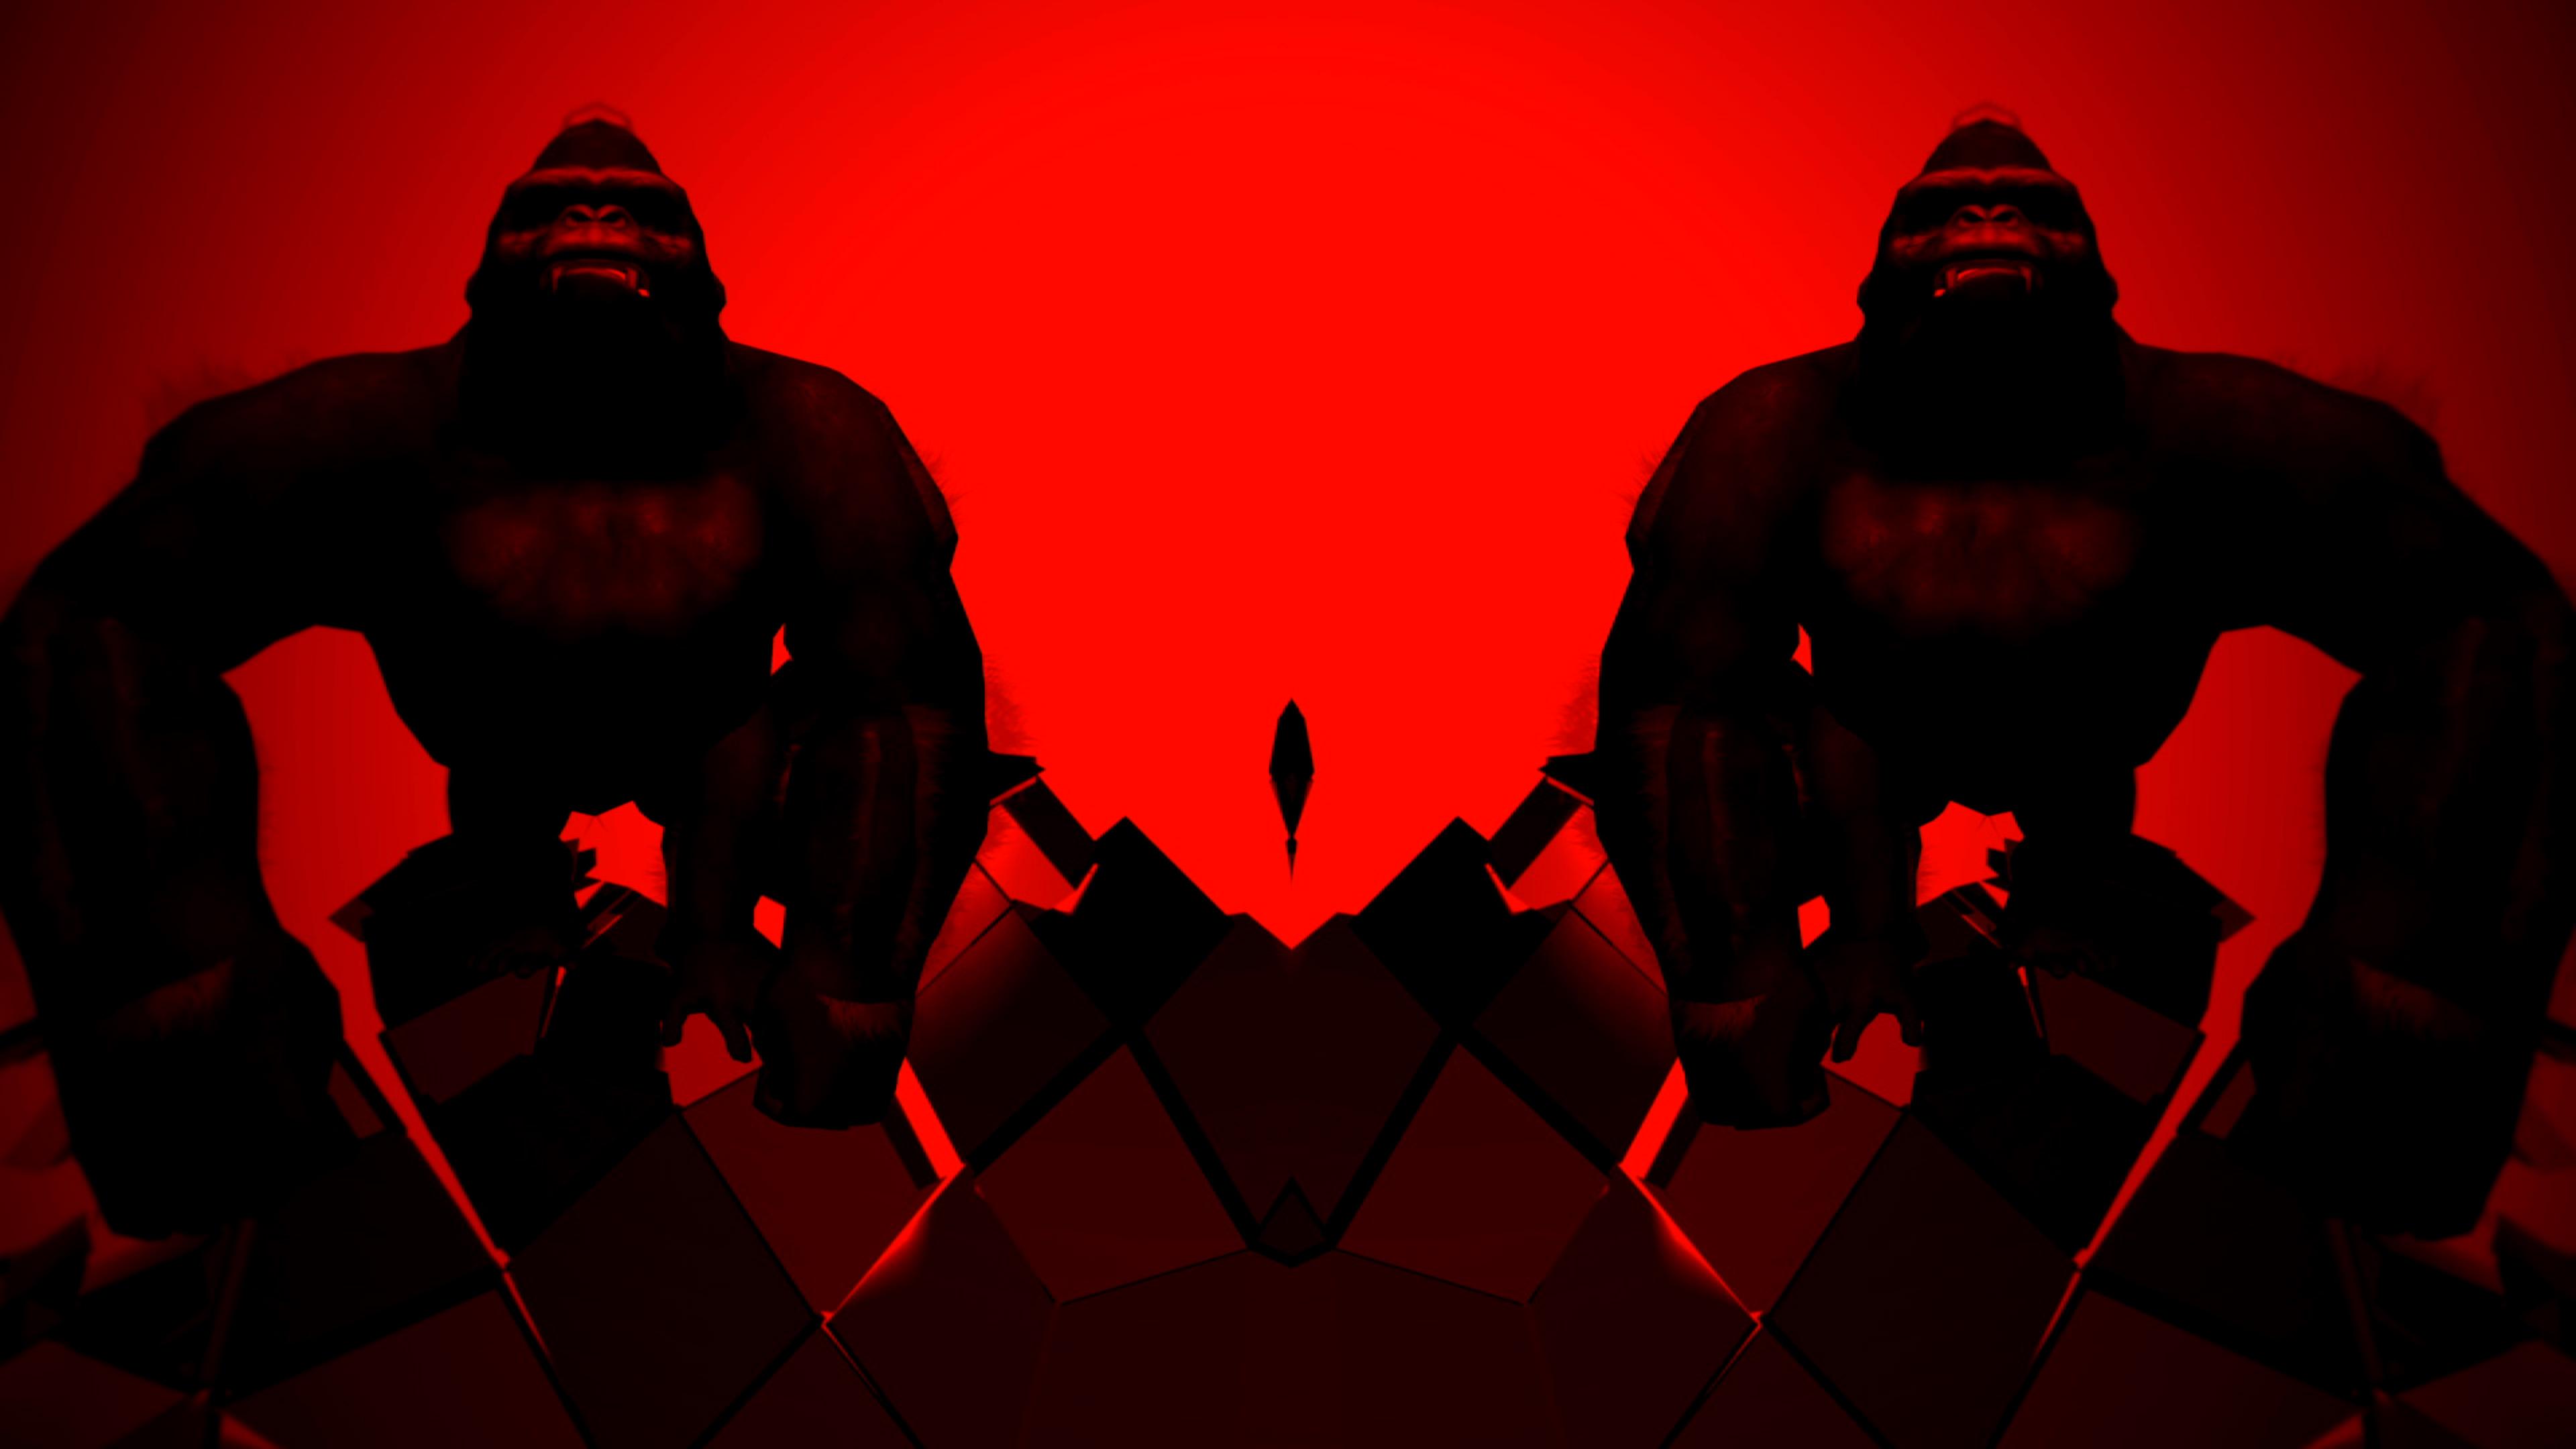 gorilla edm video animation 3d vj loop